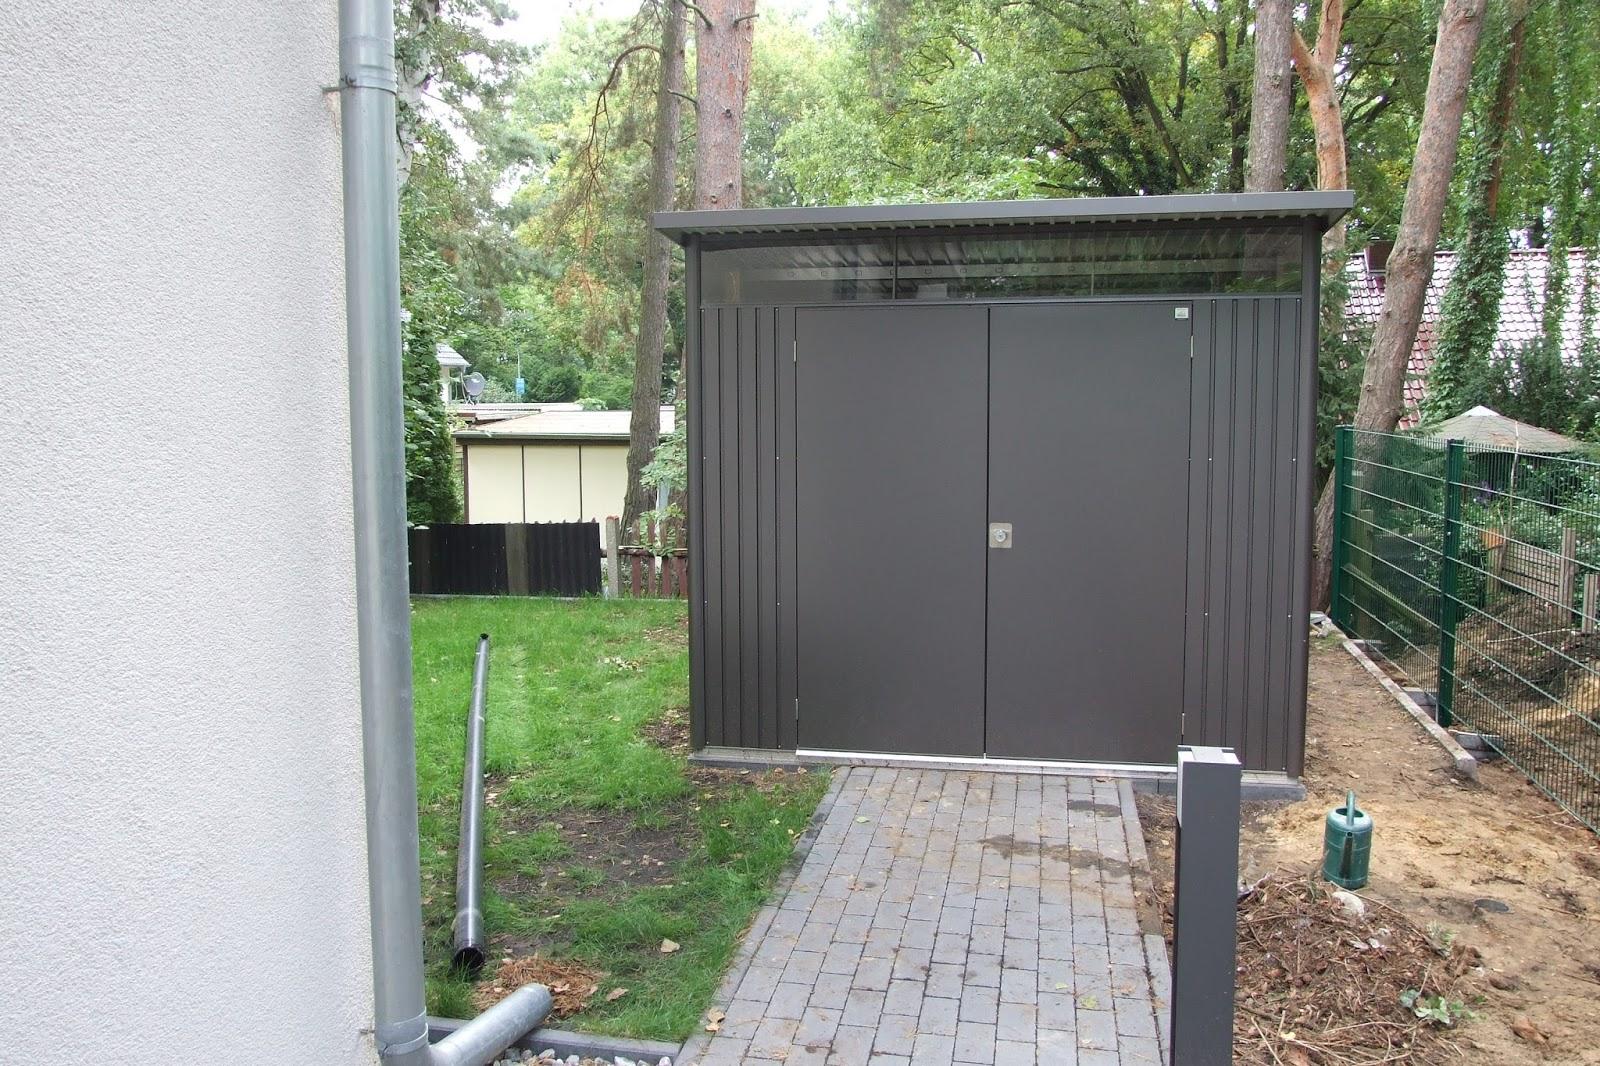 gartenhaus metall anthrazit el78 hitoiro. Black Bedroom Furniture Sets. Home Design Ideas